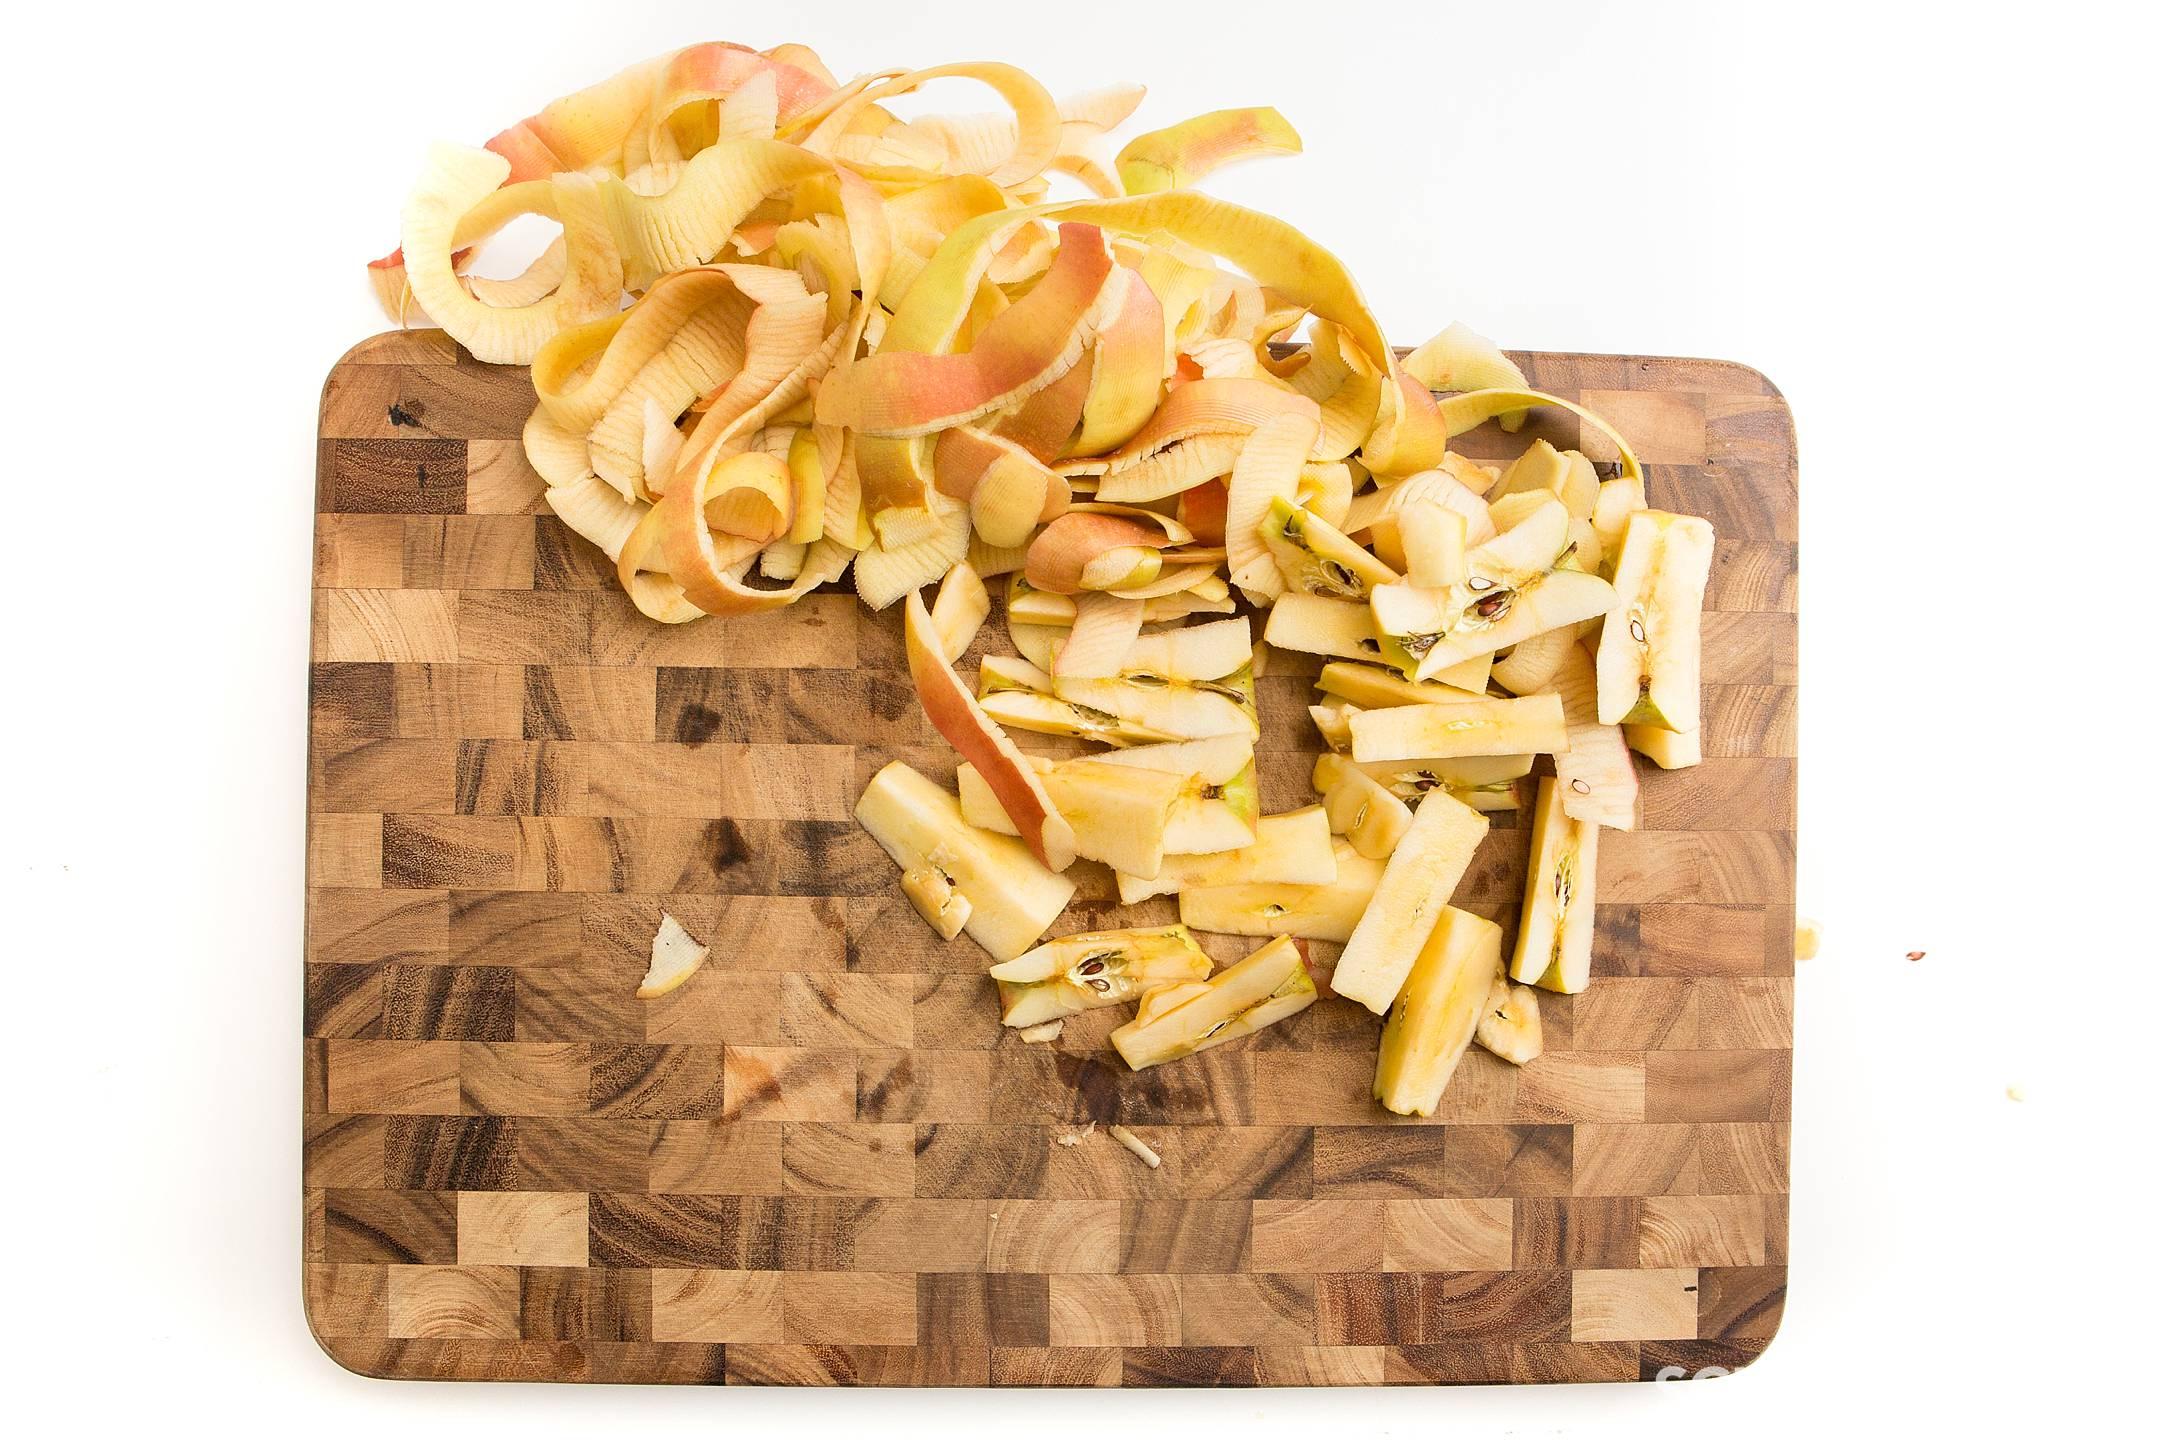 How to prepare apples to make homemade applesuace